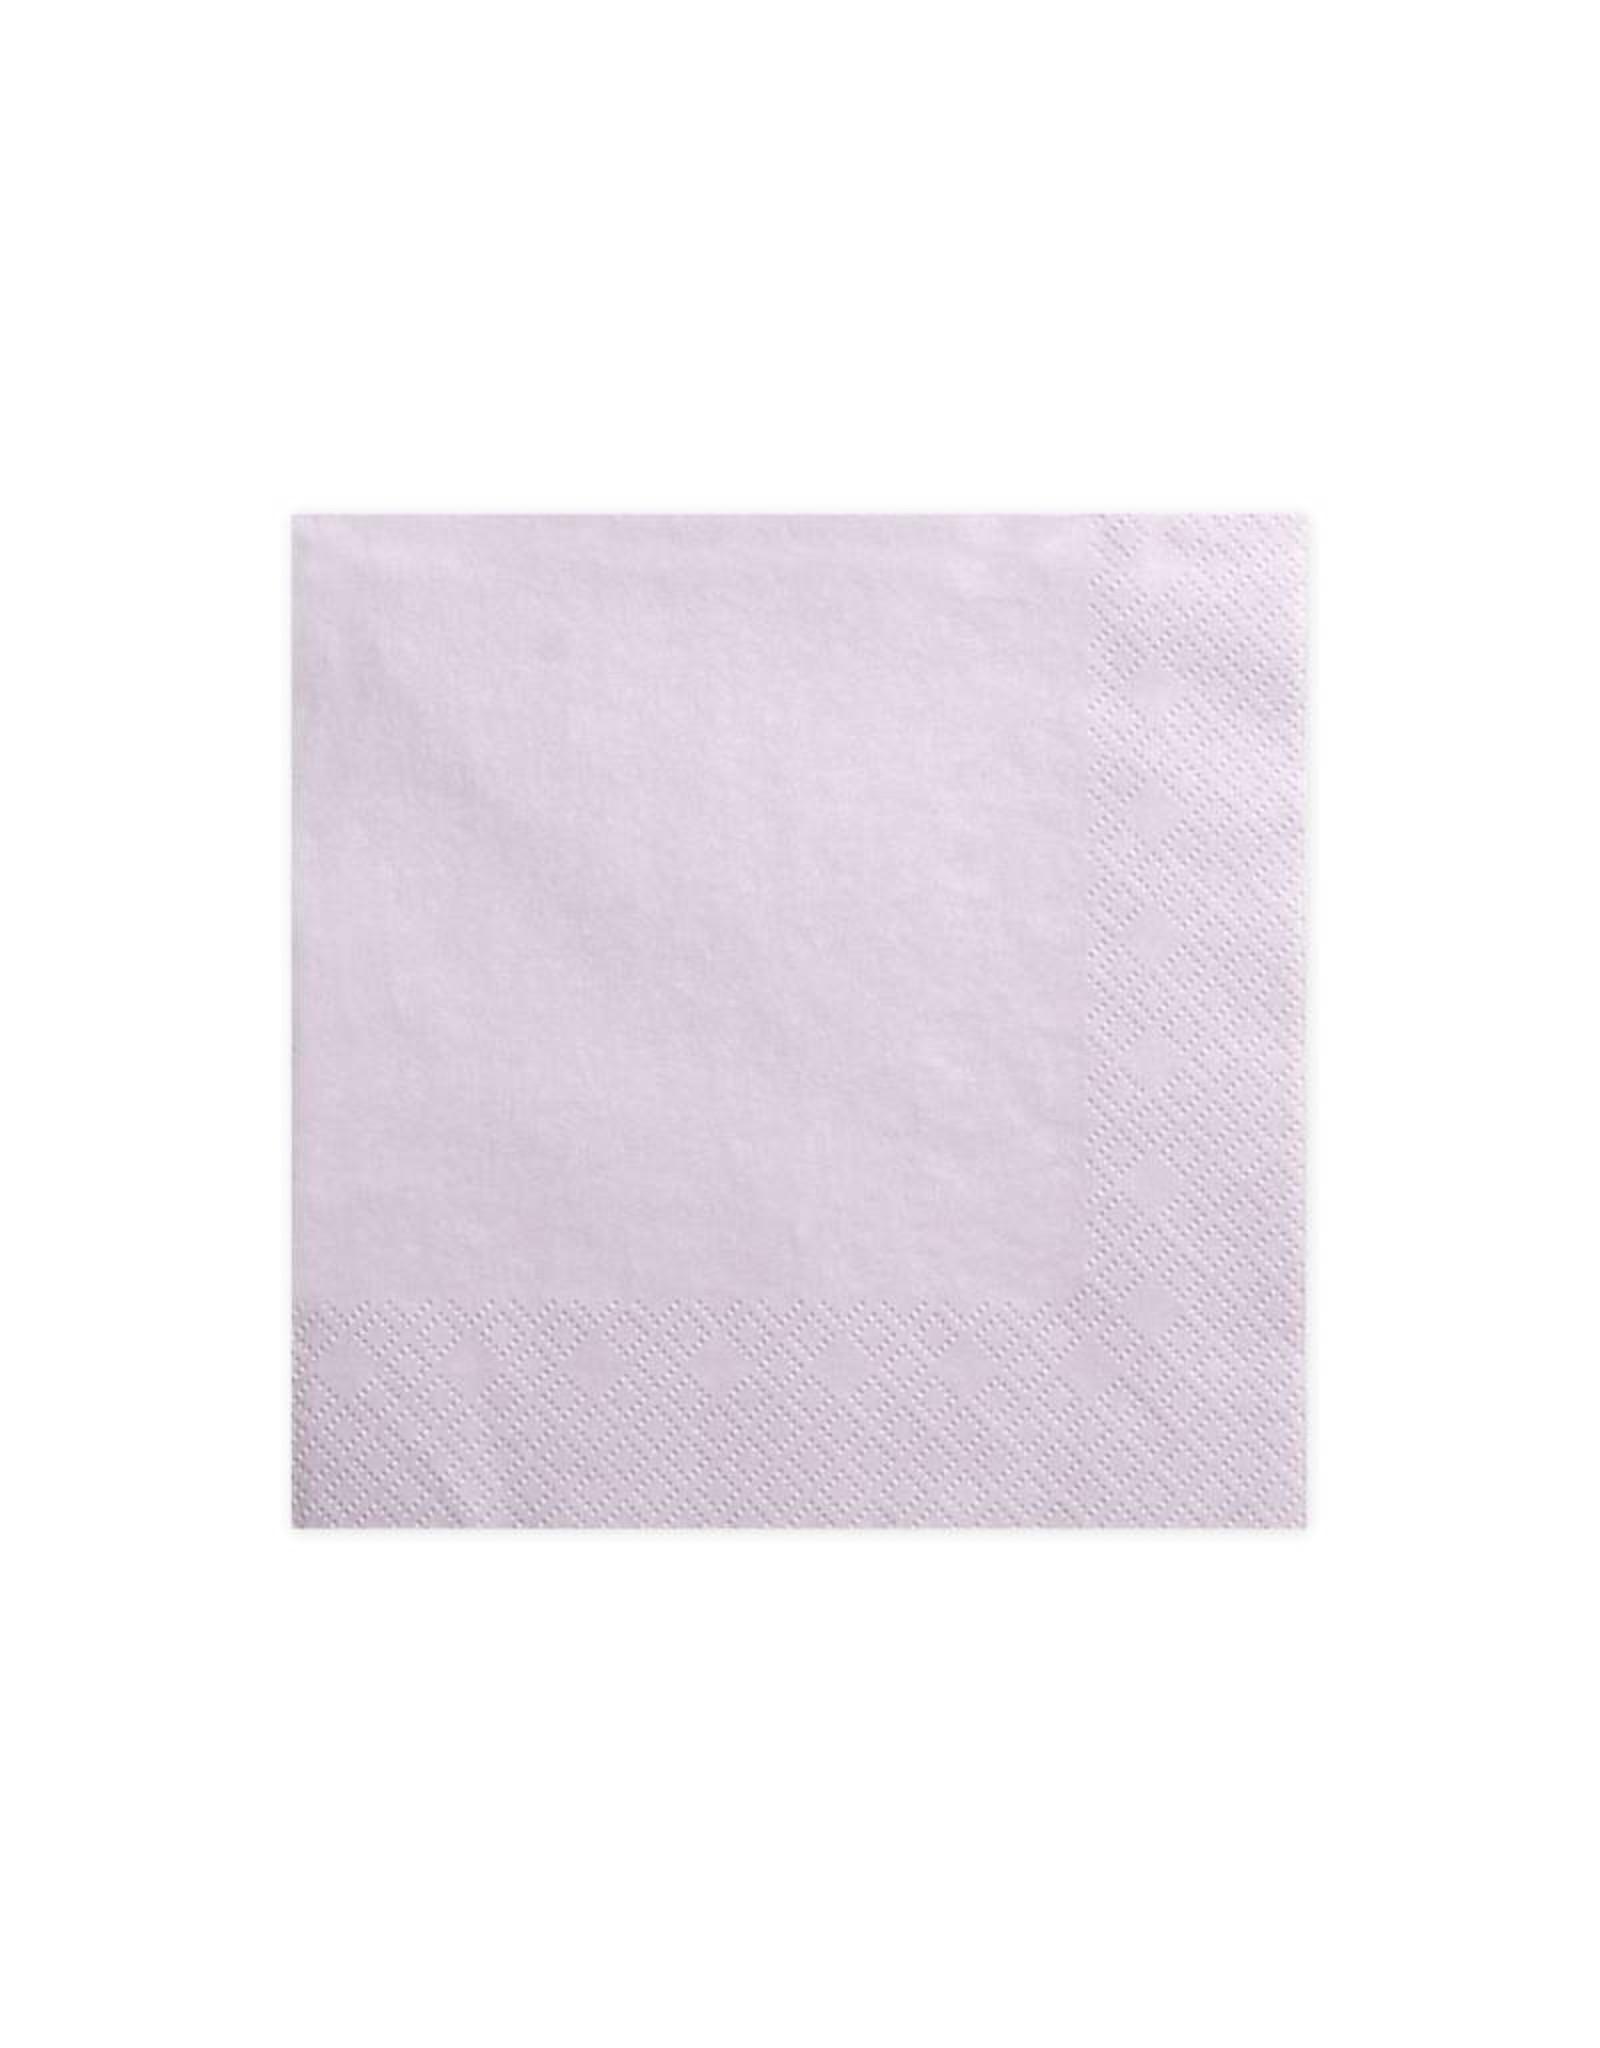 PartyDeco Servetten lavendel paars | 20 stuks